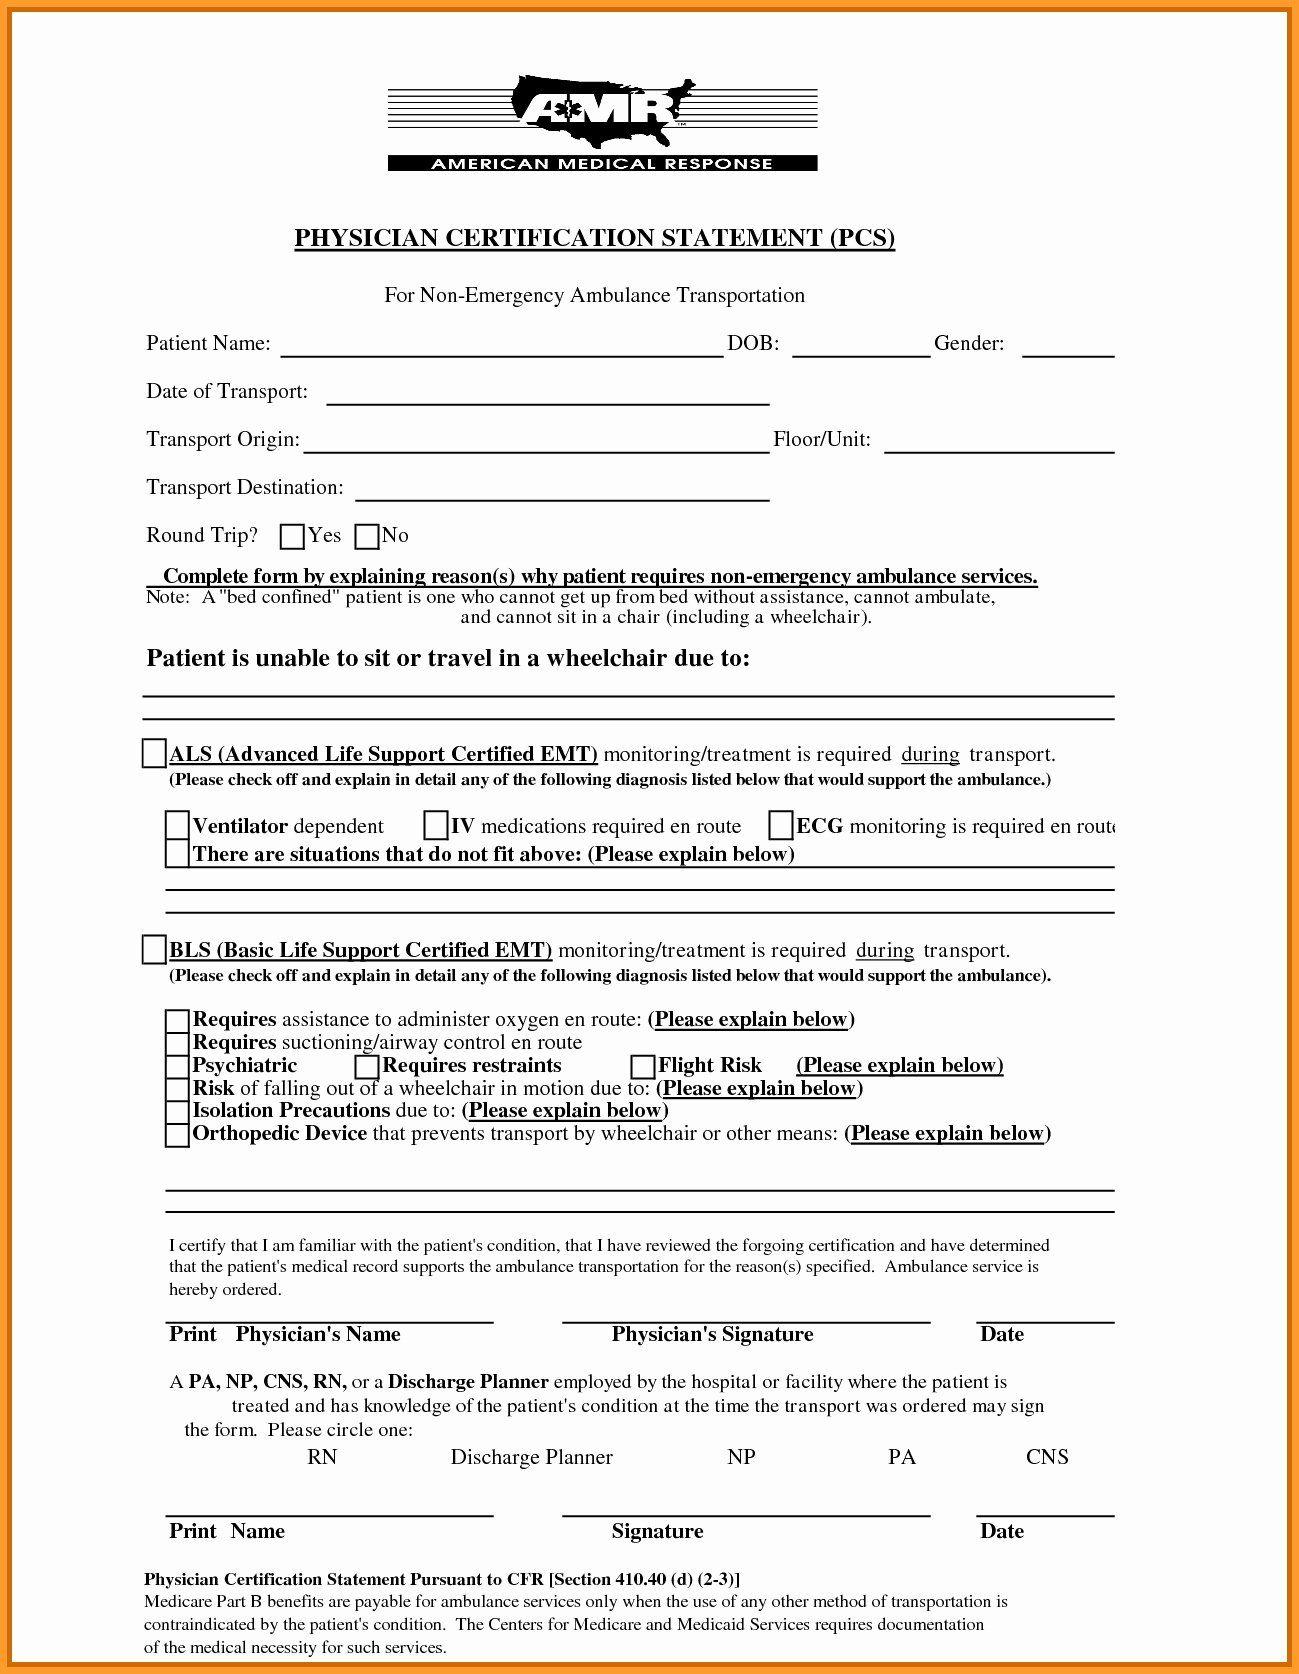 Fake Hospital Discharge Forms Elegant Fake Hospital Discharge Paperwork Templates Printable Chart What Is Fake Fake hospital discharge papers template